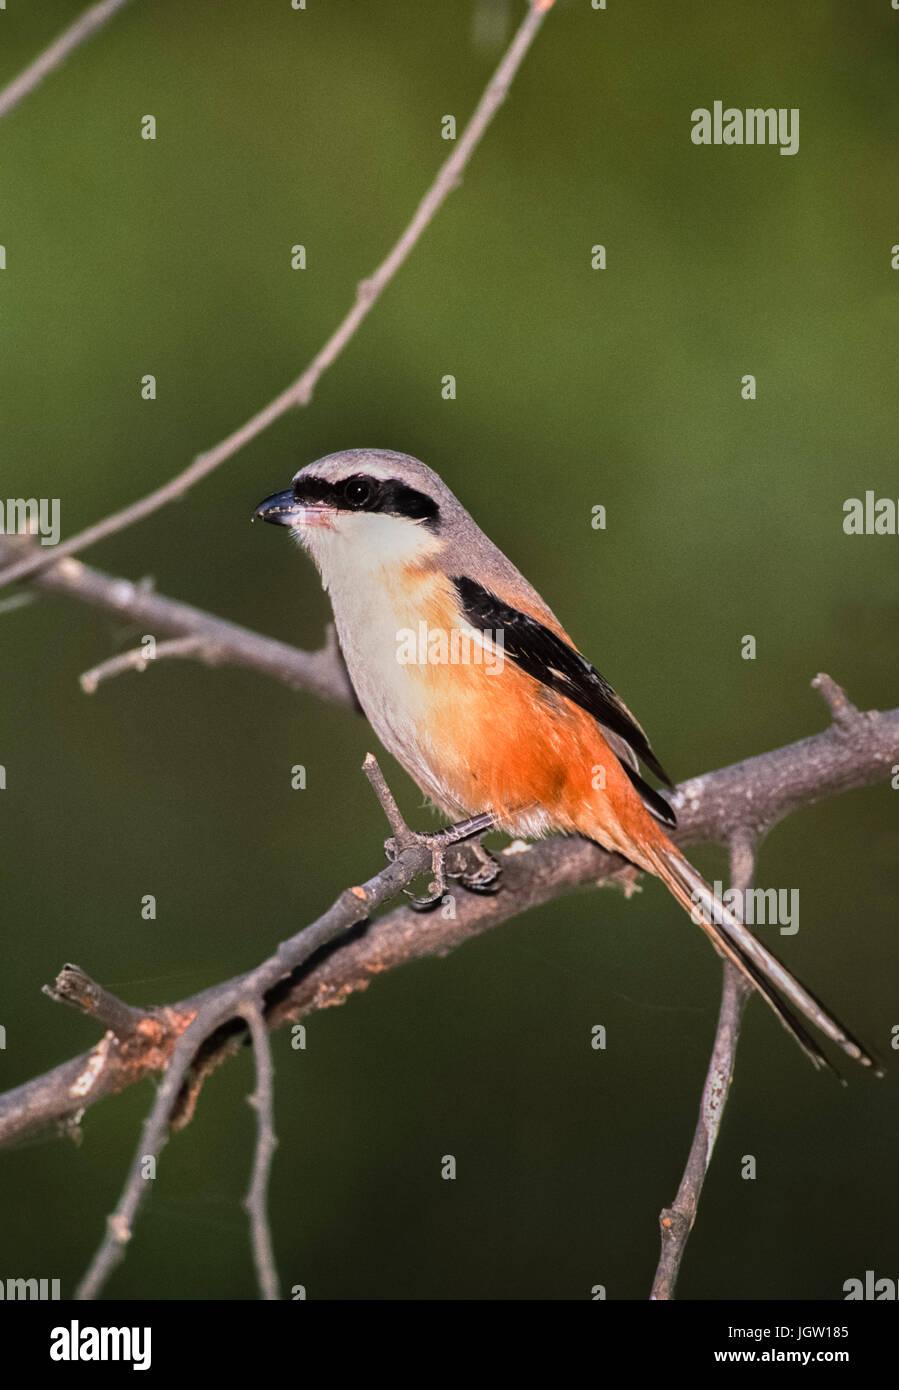 Long-Tailed Shrike or Rufous-Backed Shrike, (Lanius schach),Keoladeo Ghana National Park, Bharatpur, Rajasthan, - Stock Image